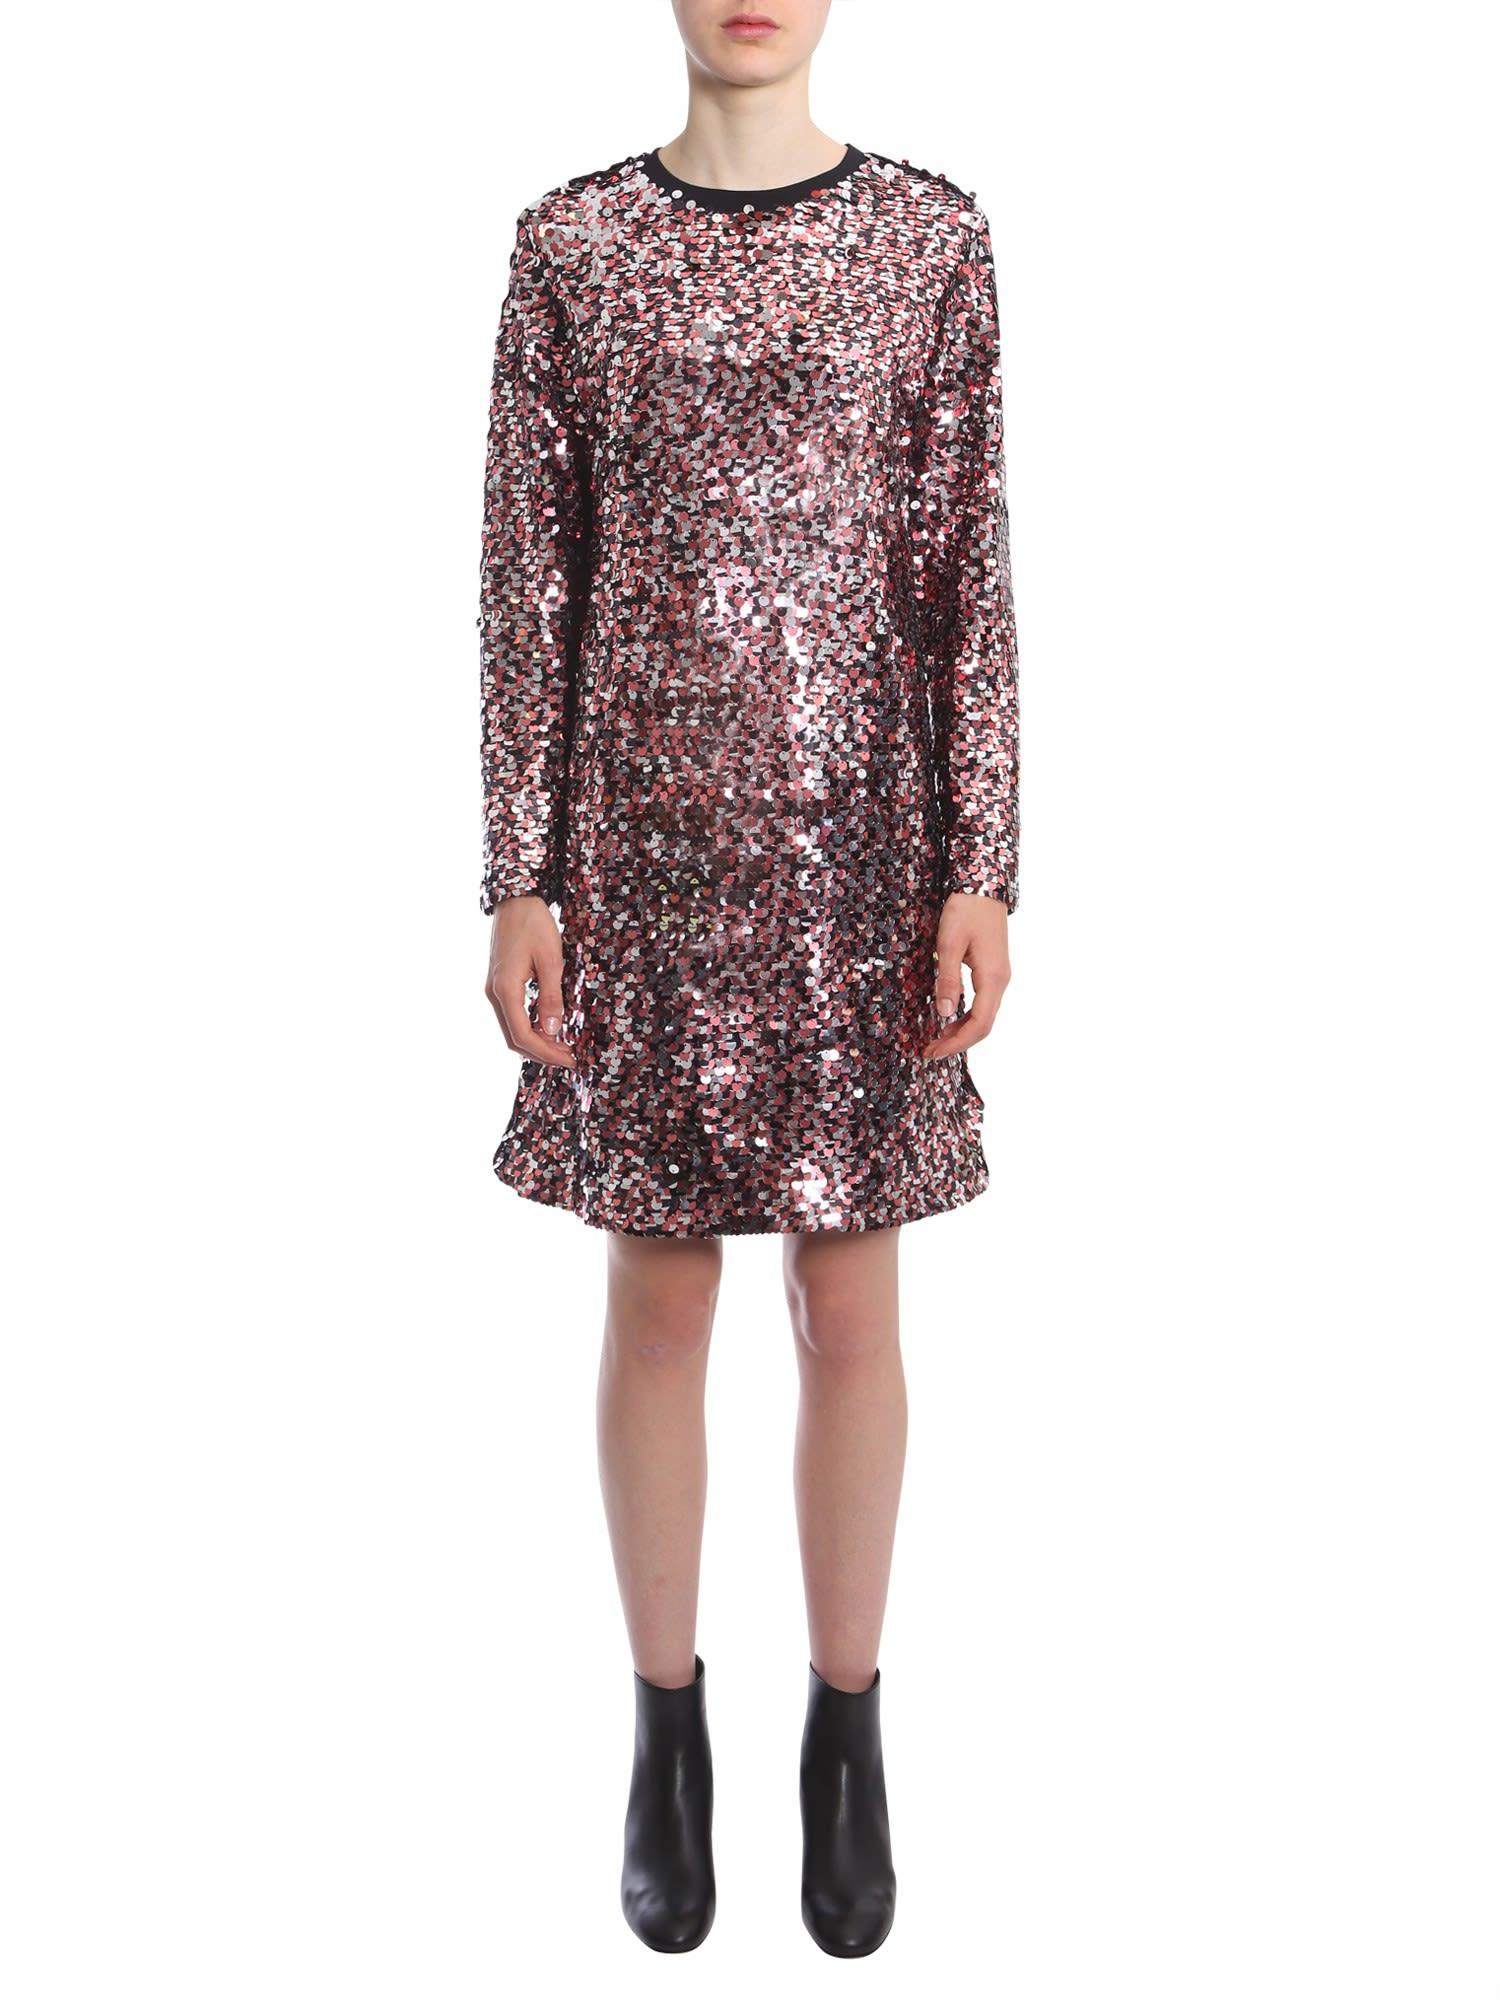 McQ Alexander McQueen Sequin Dress